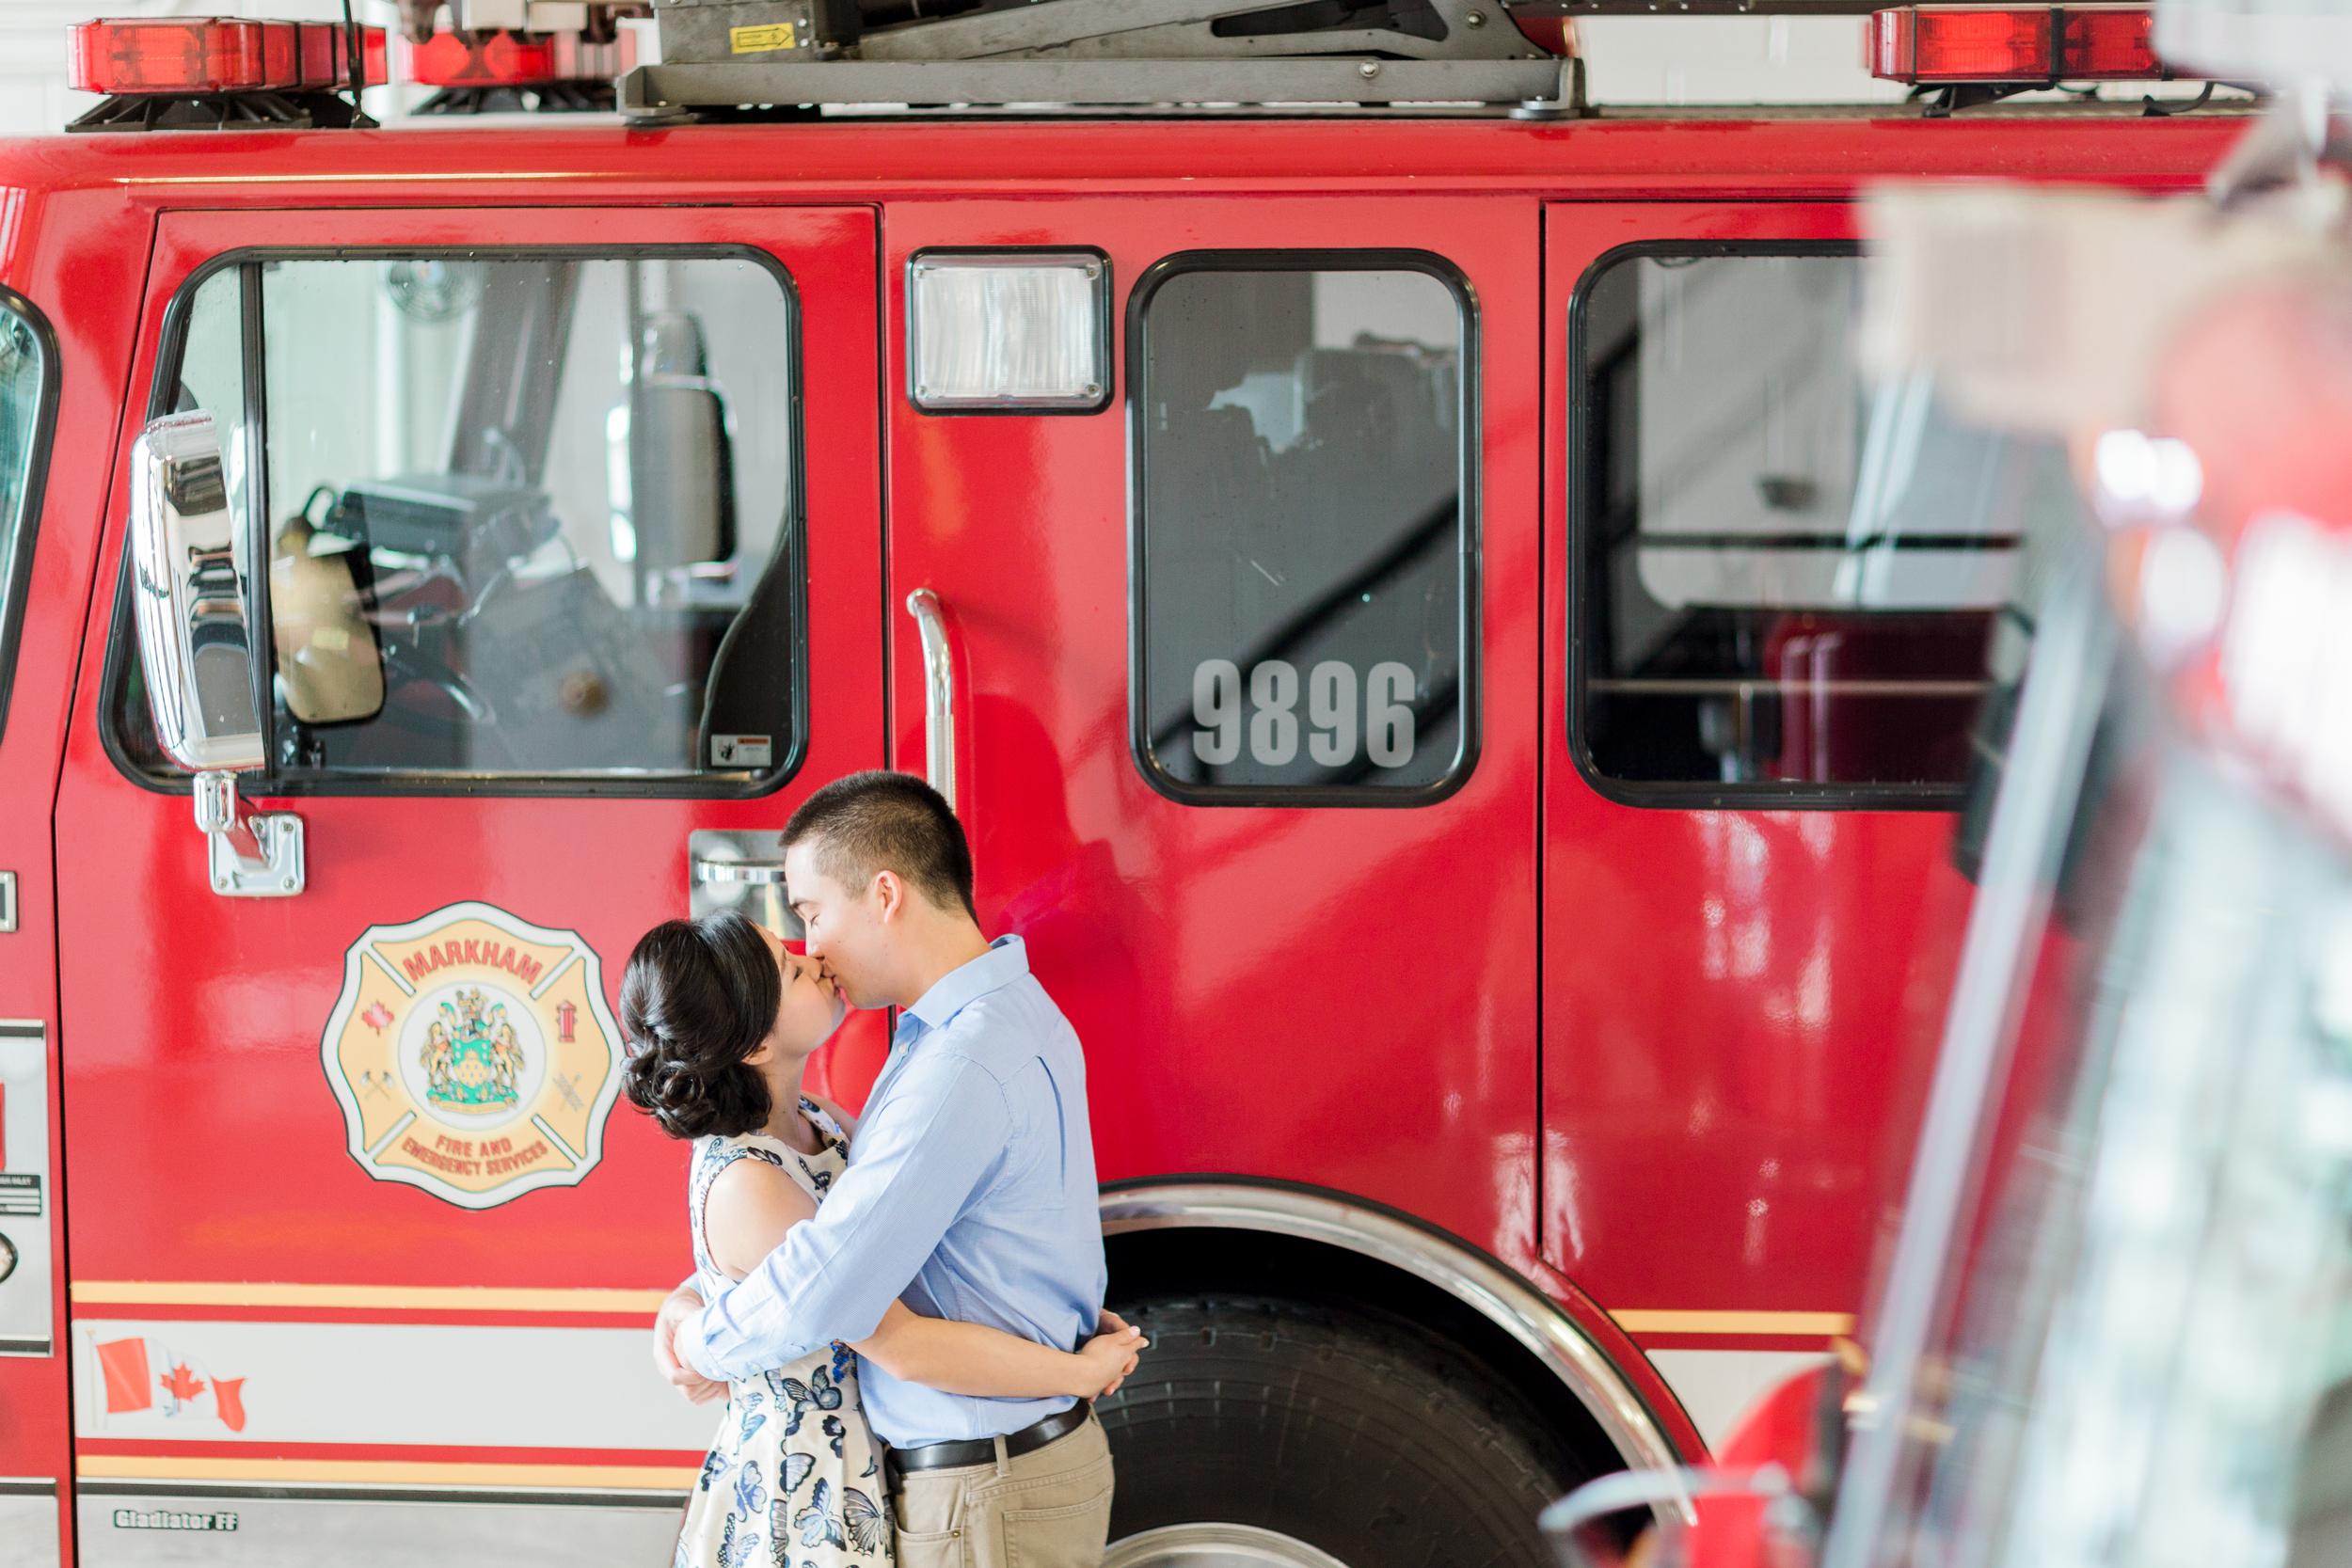 Cari Zhu Photography - Markham Fire Station Engagement Session-4475.jpg